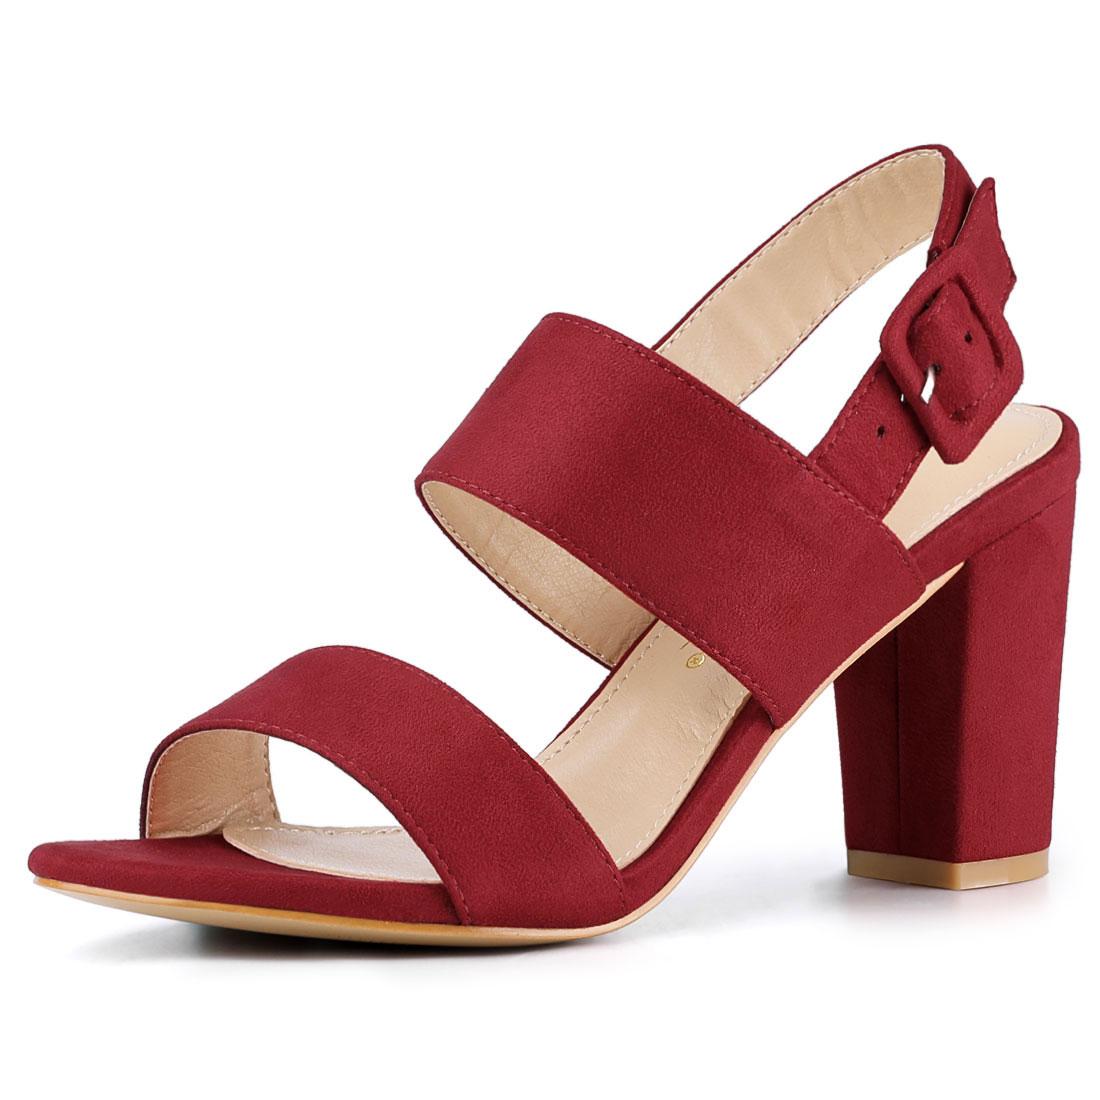 Women Open Toe Slingback High Block Heel Sandals Red US 6